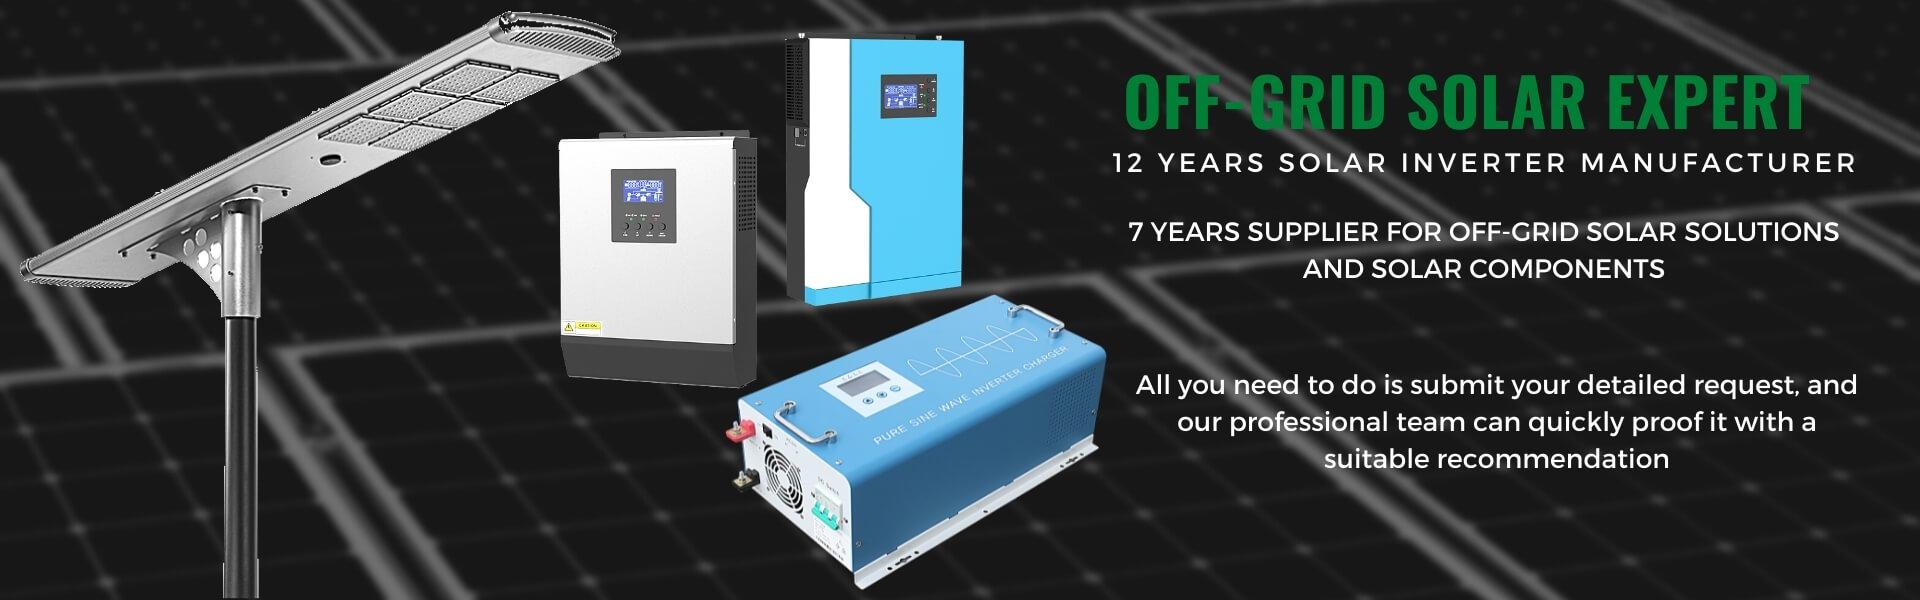 Power inverter, MPPT controller, off-grid solar system, MILESOLAR